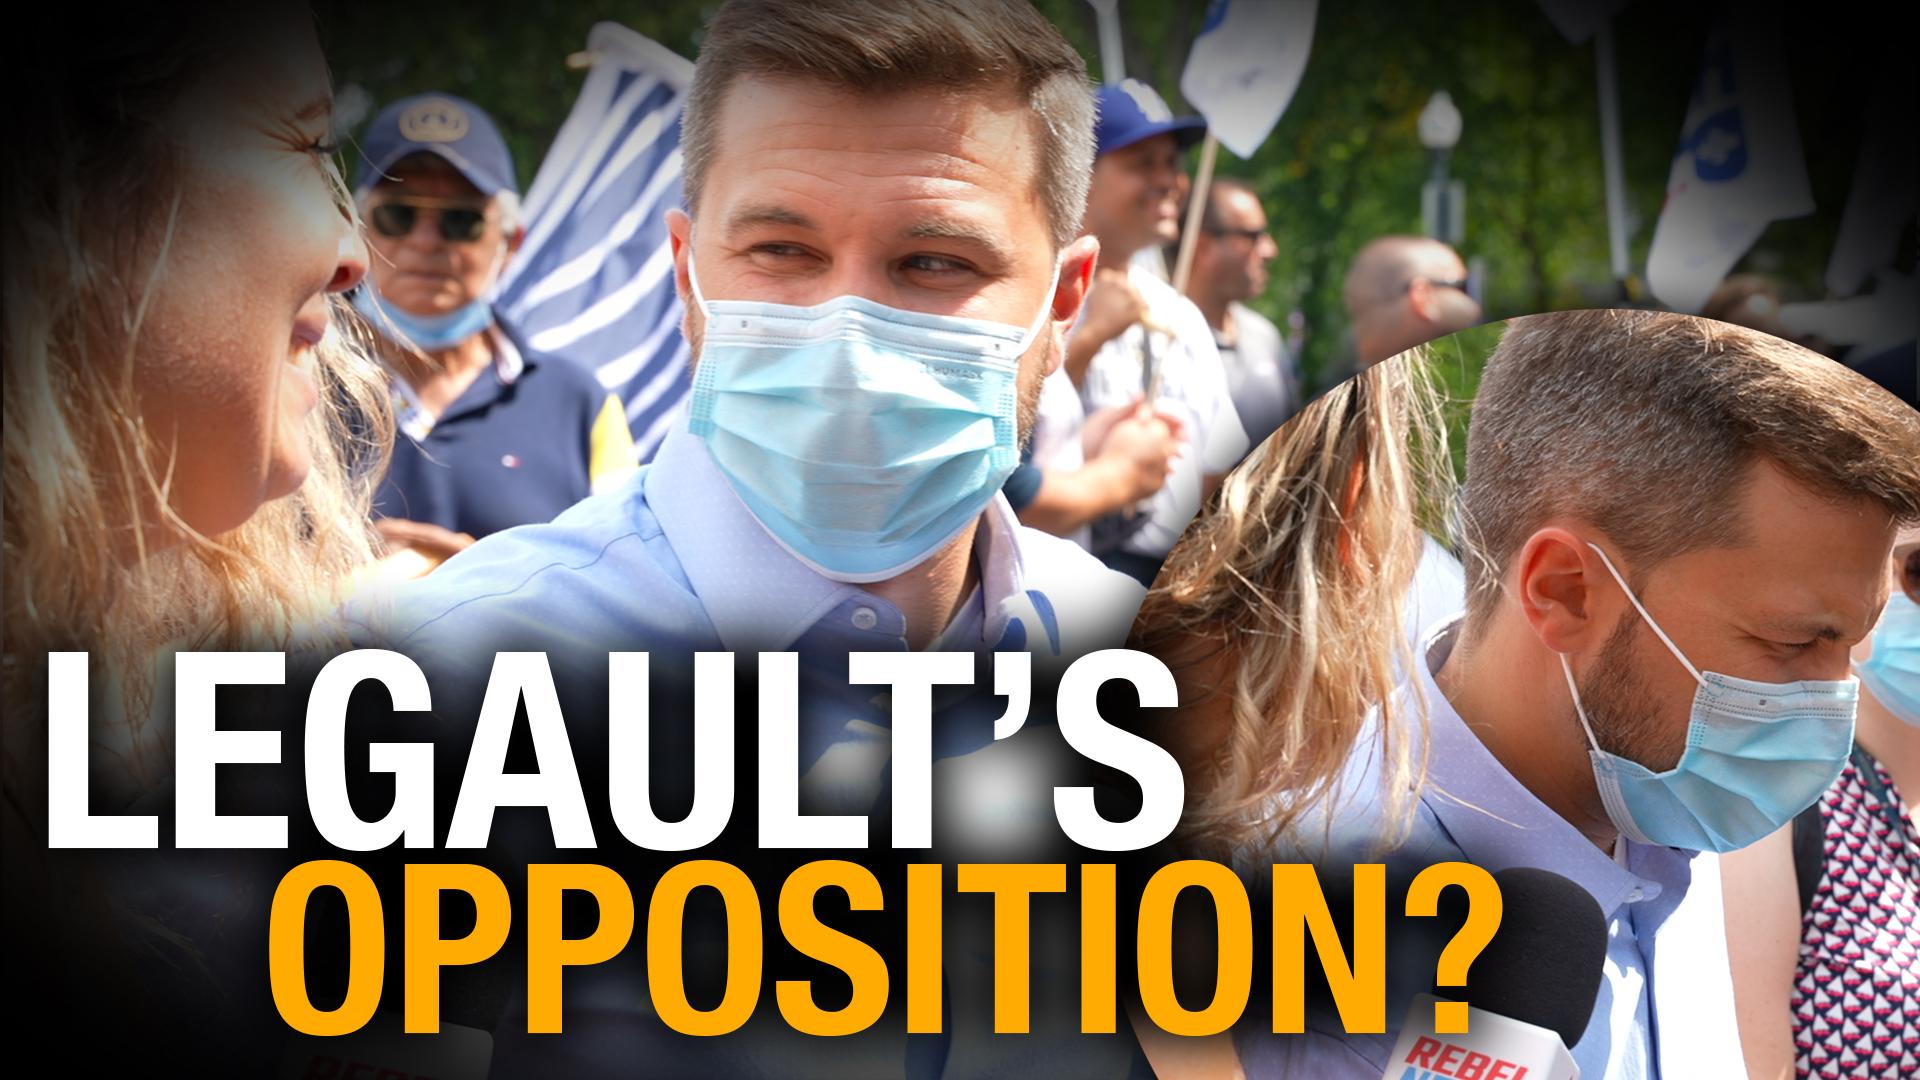 Quebec's opposition leader Gabriel Nadeau-Dubois: